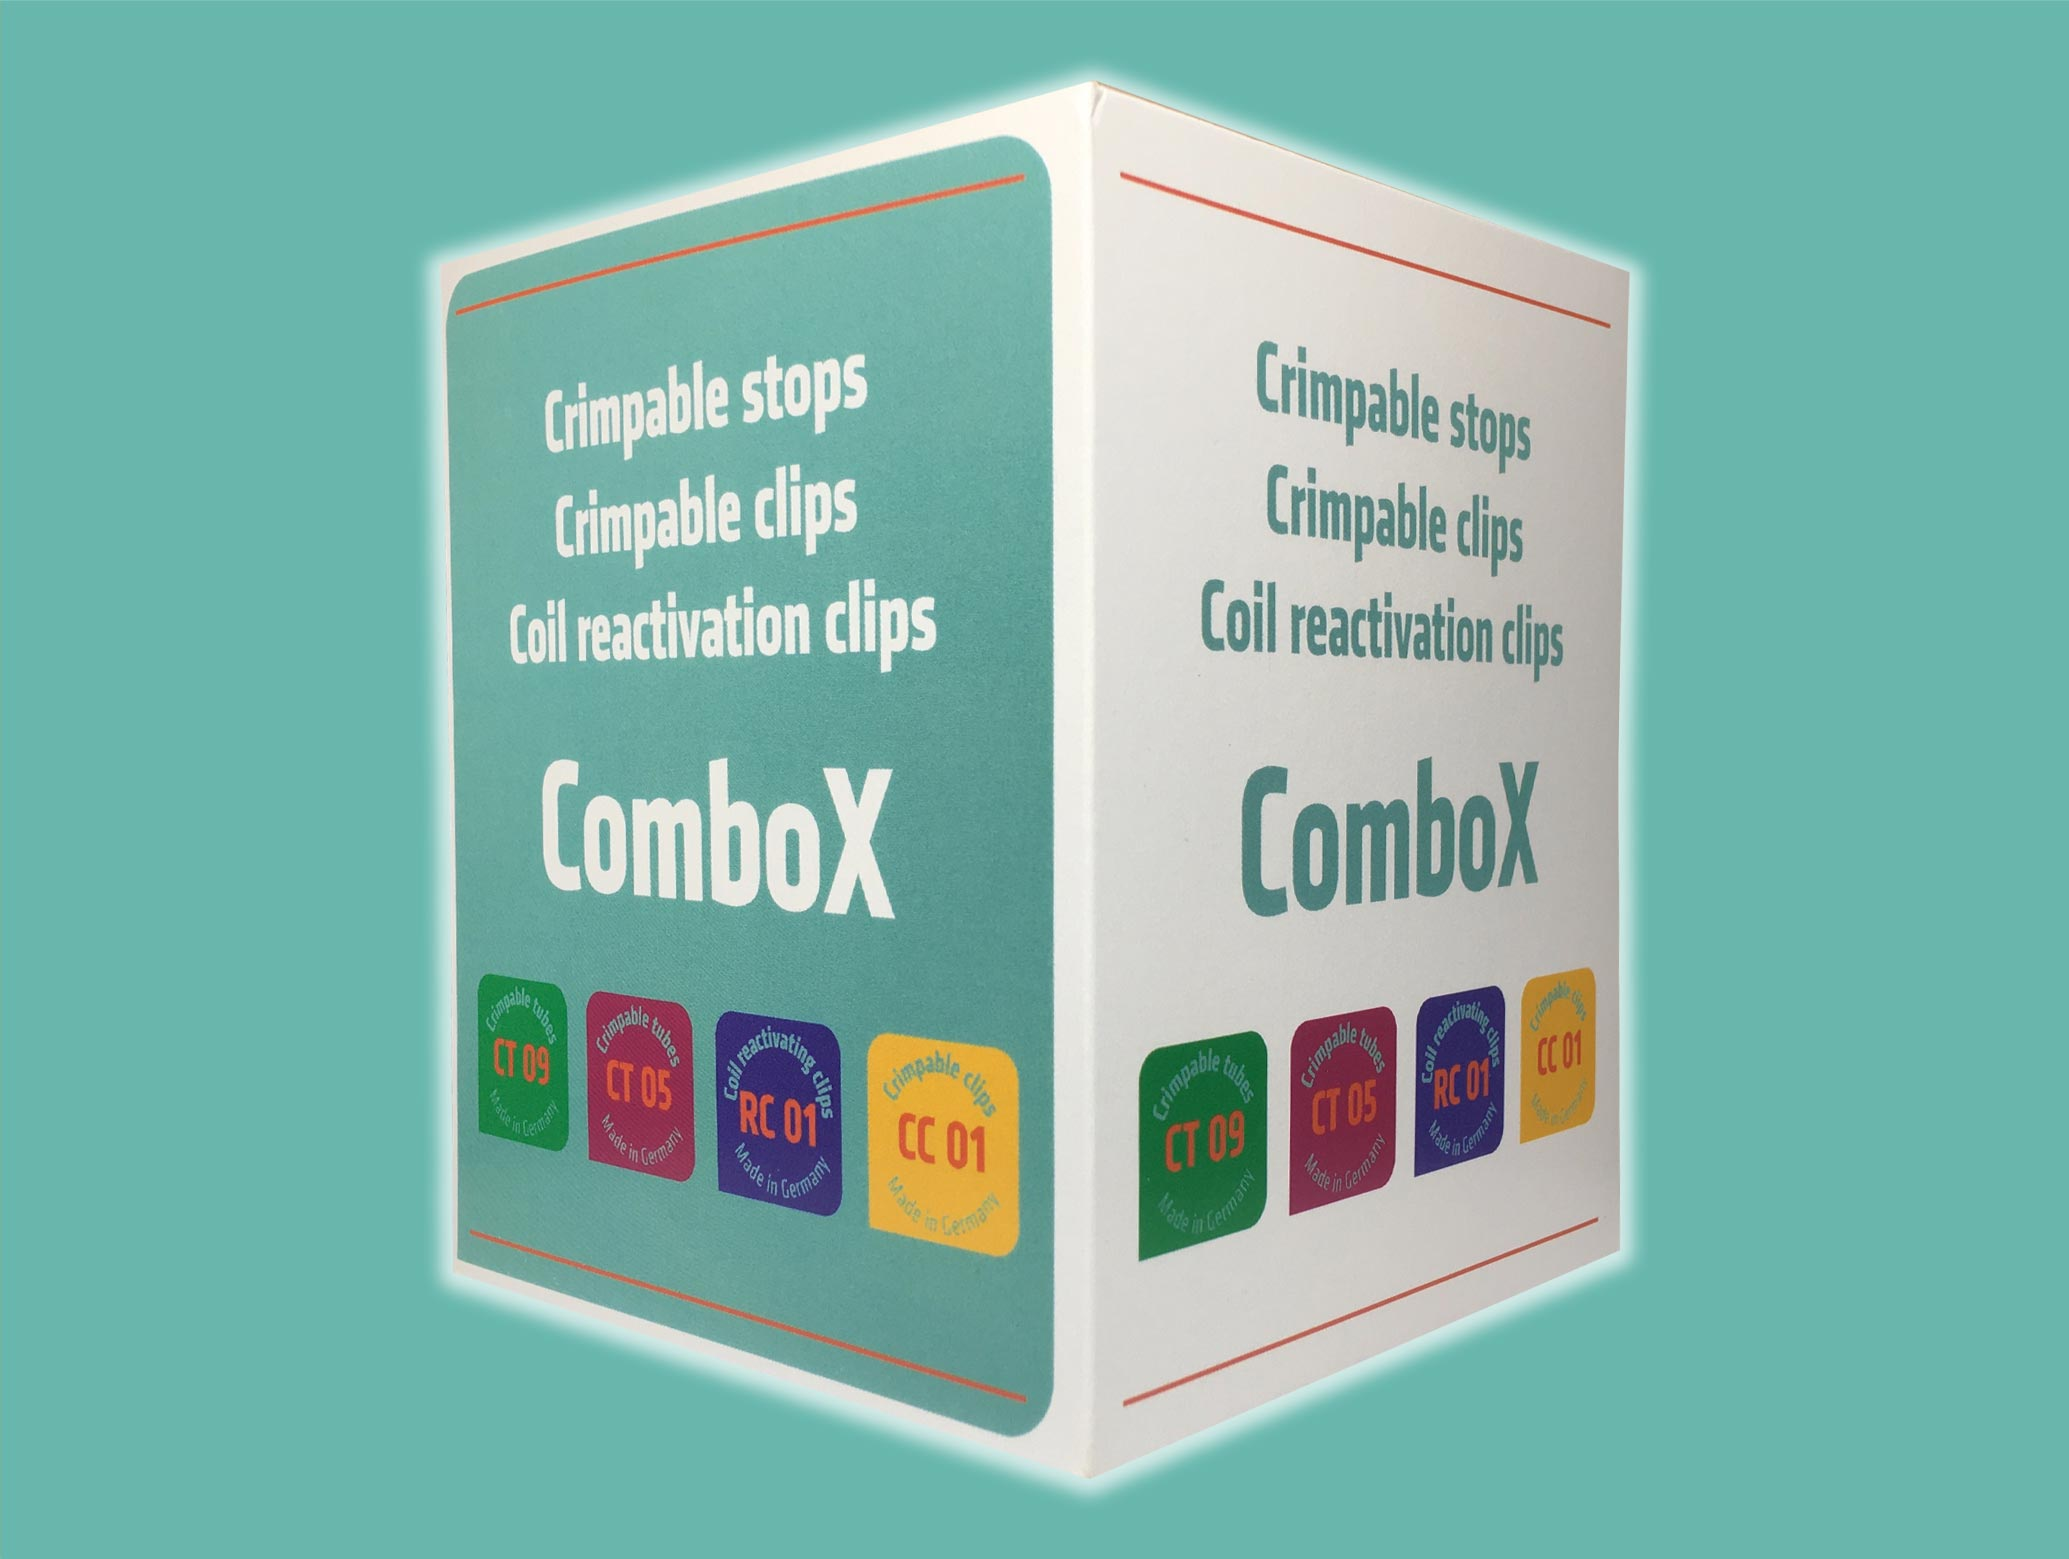 MiXit – ComboX. Individuell befüllbar mit insgesamt 9 TowerX-Boxes